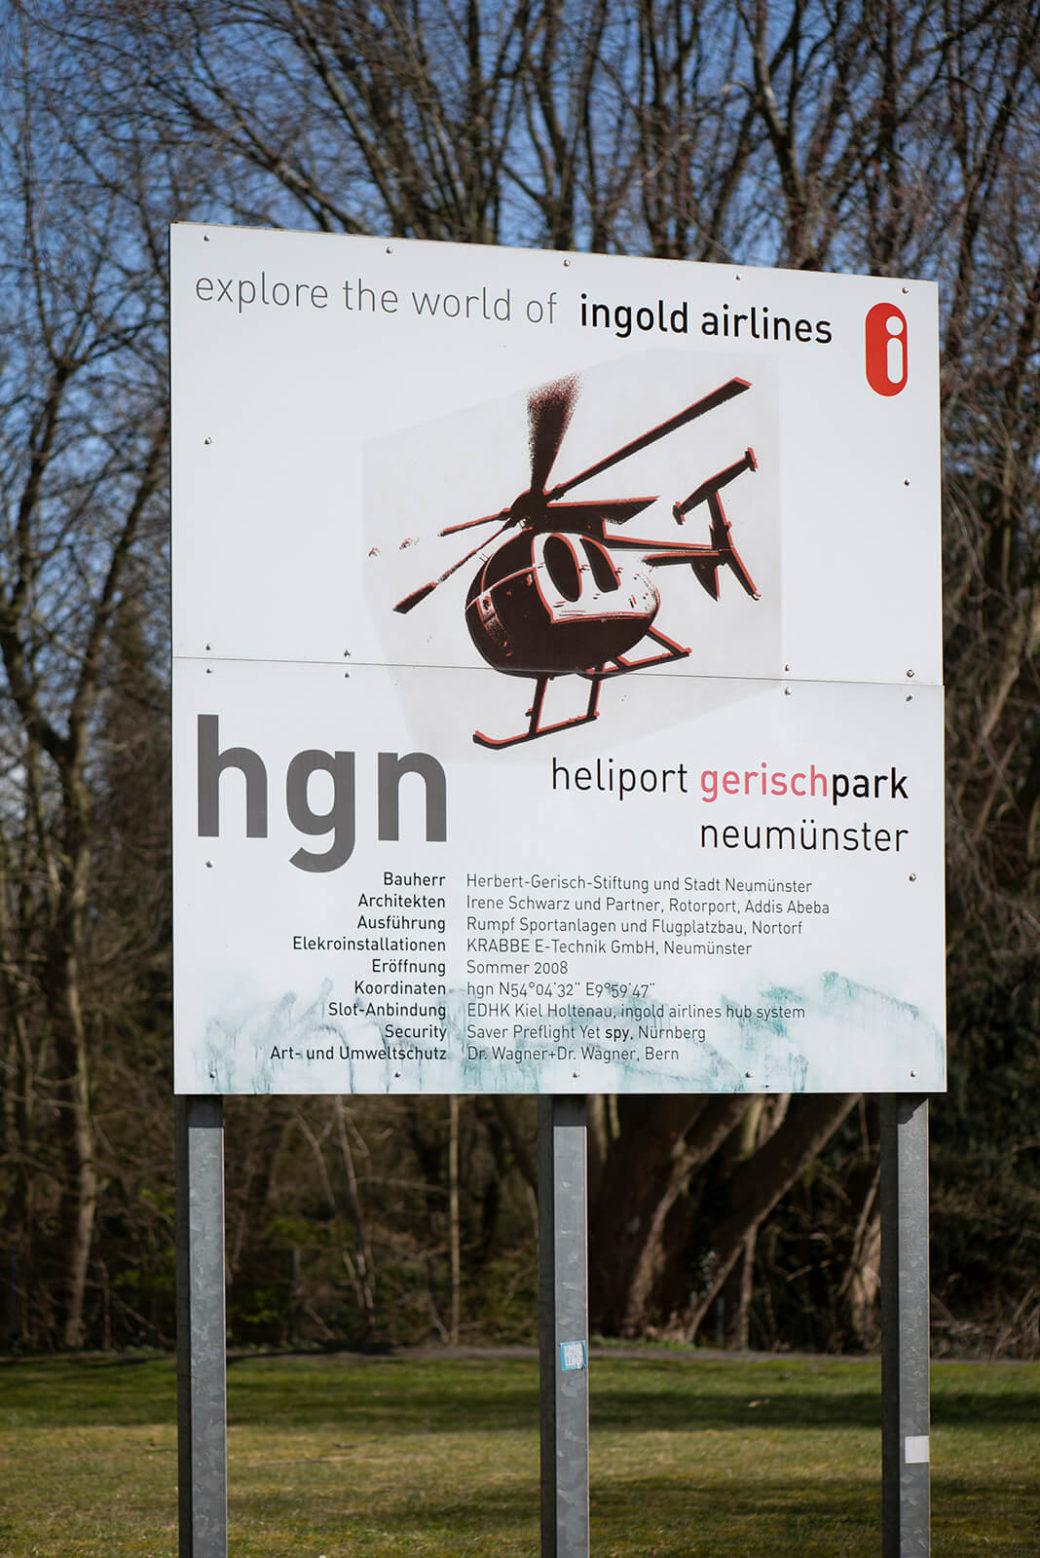 Res Ingold: Heliport Gerisch-Park Neumünster (Foto: KUNST@SH/Jan Petersen, 2020)